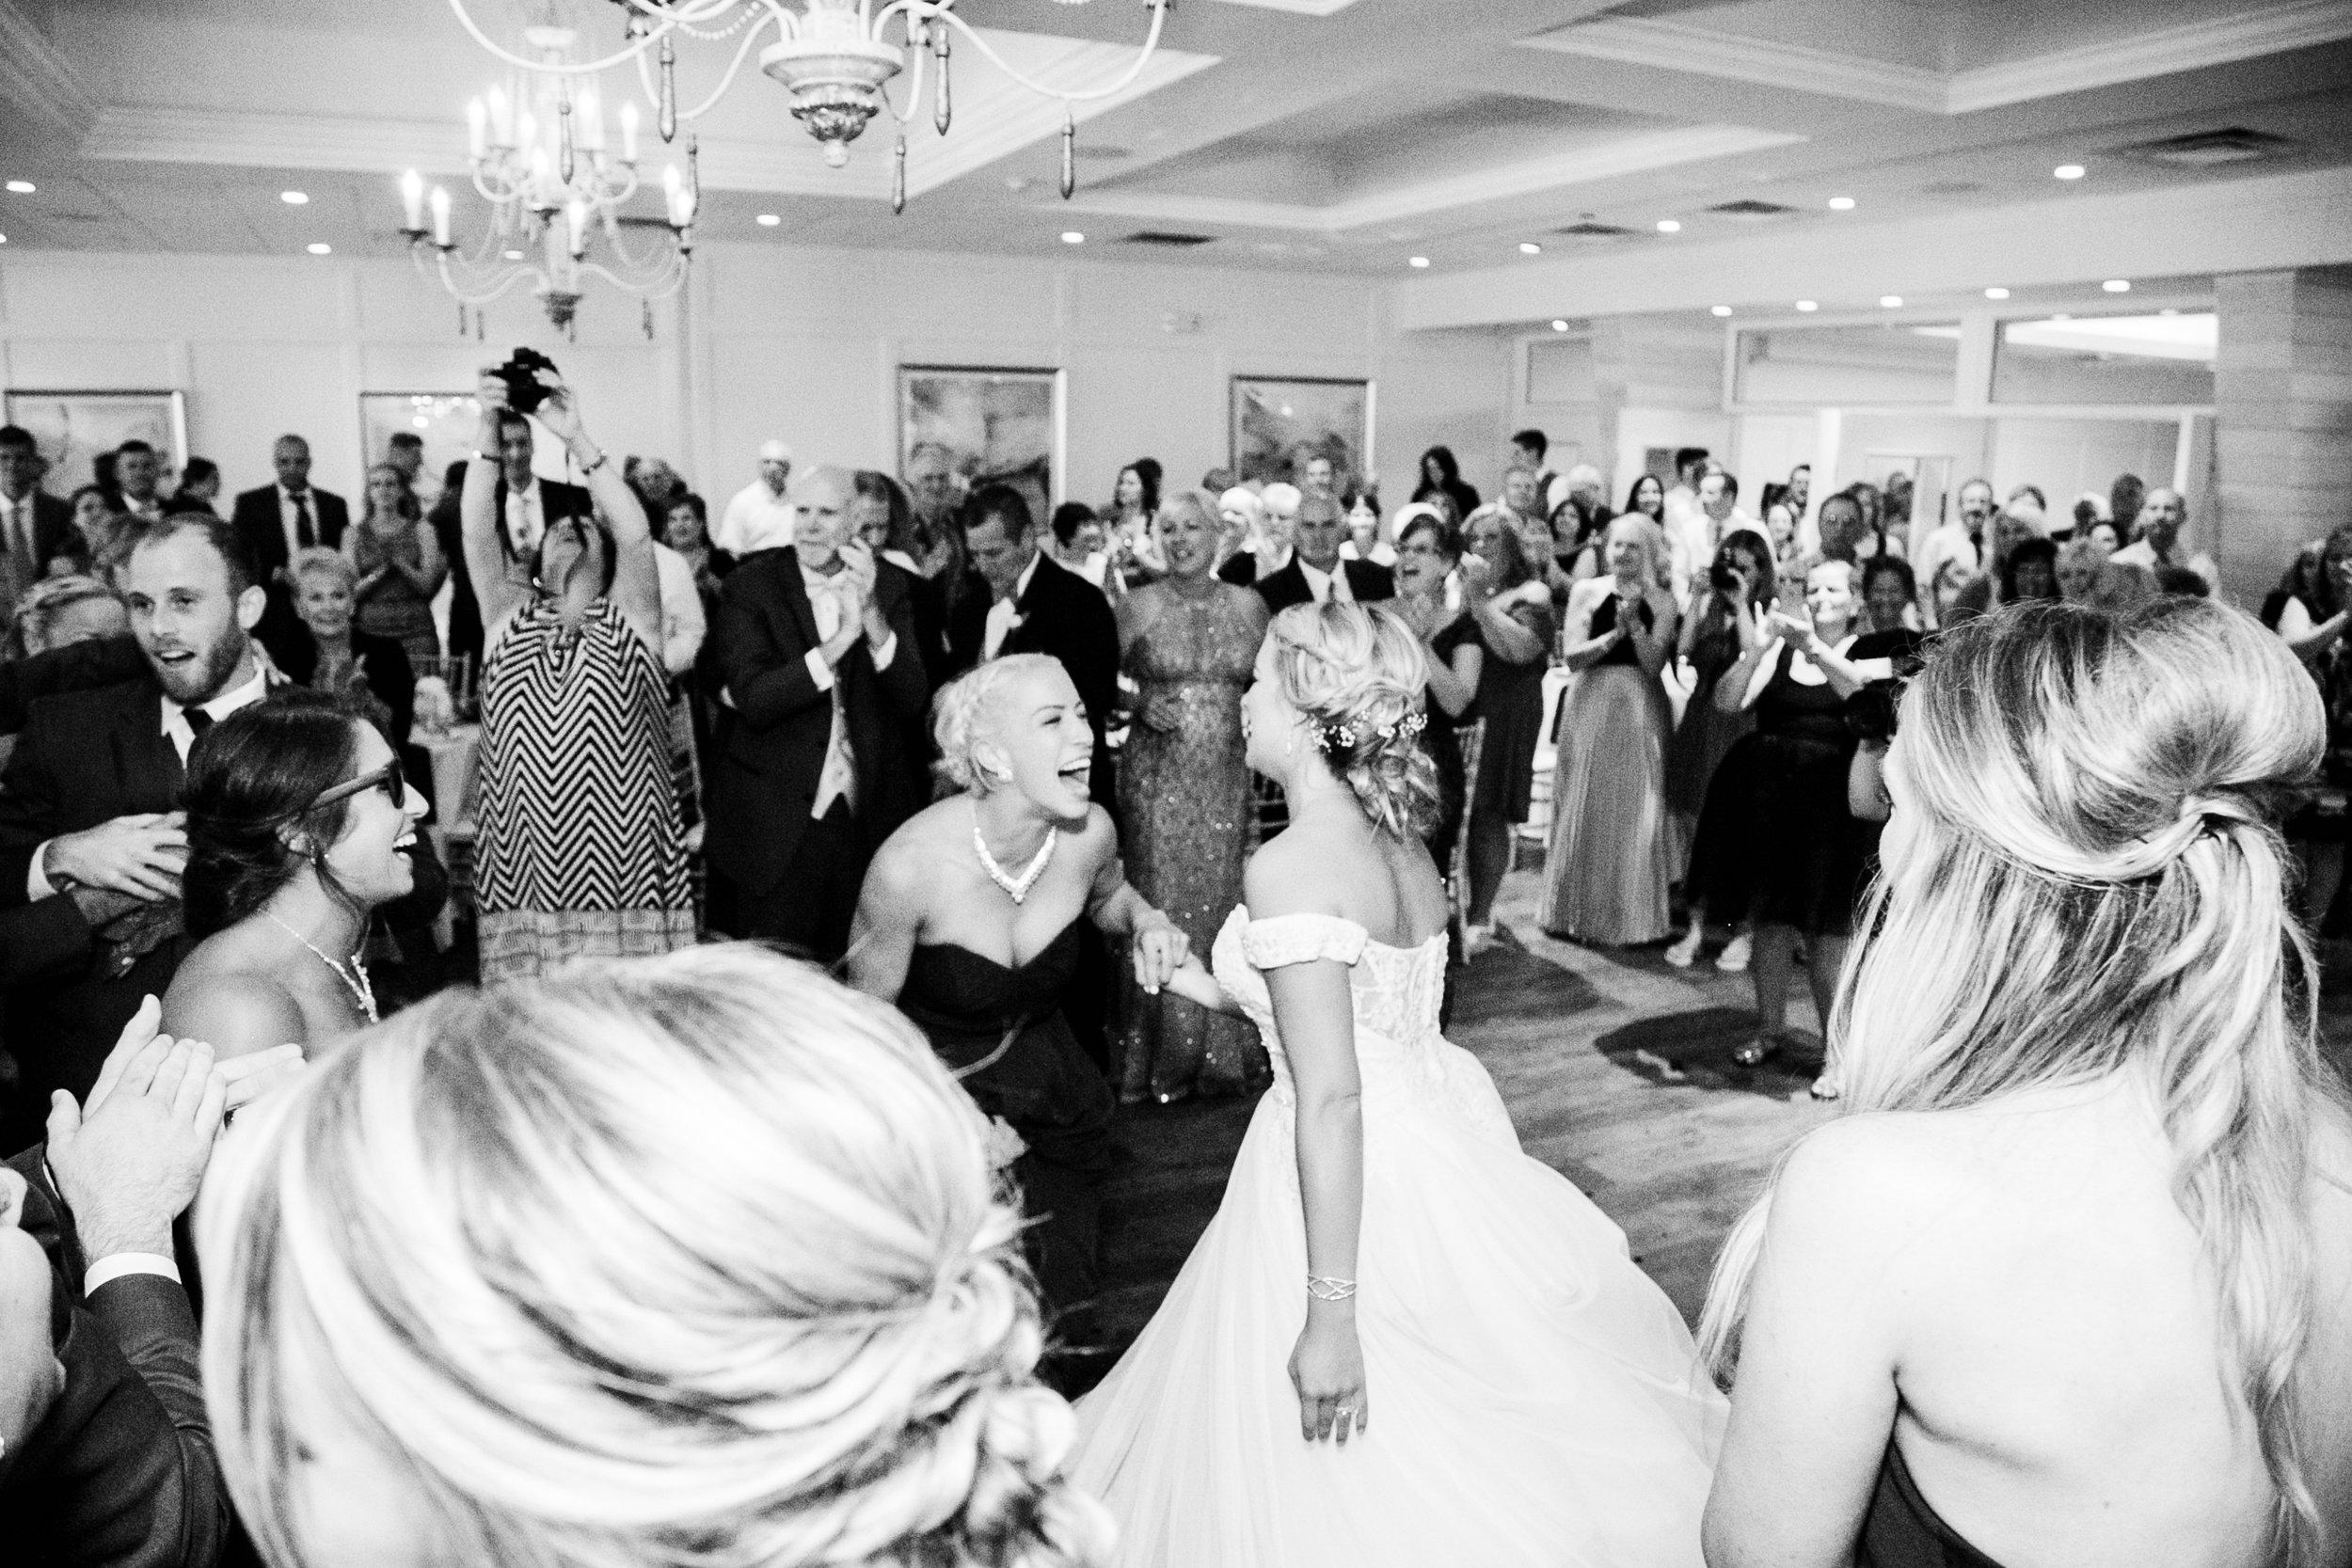 ICONA GOLDEN INN AVALON NJ WEDDING PHOTOGRAPHY  - 070.jpg